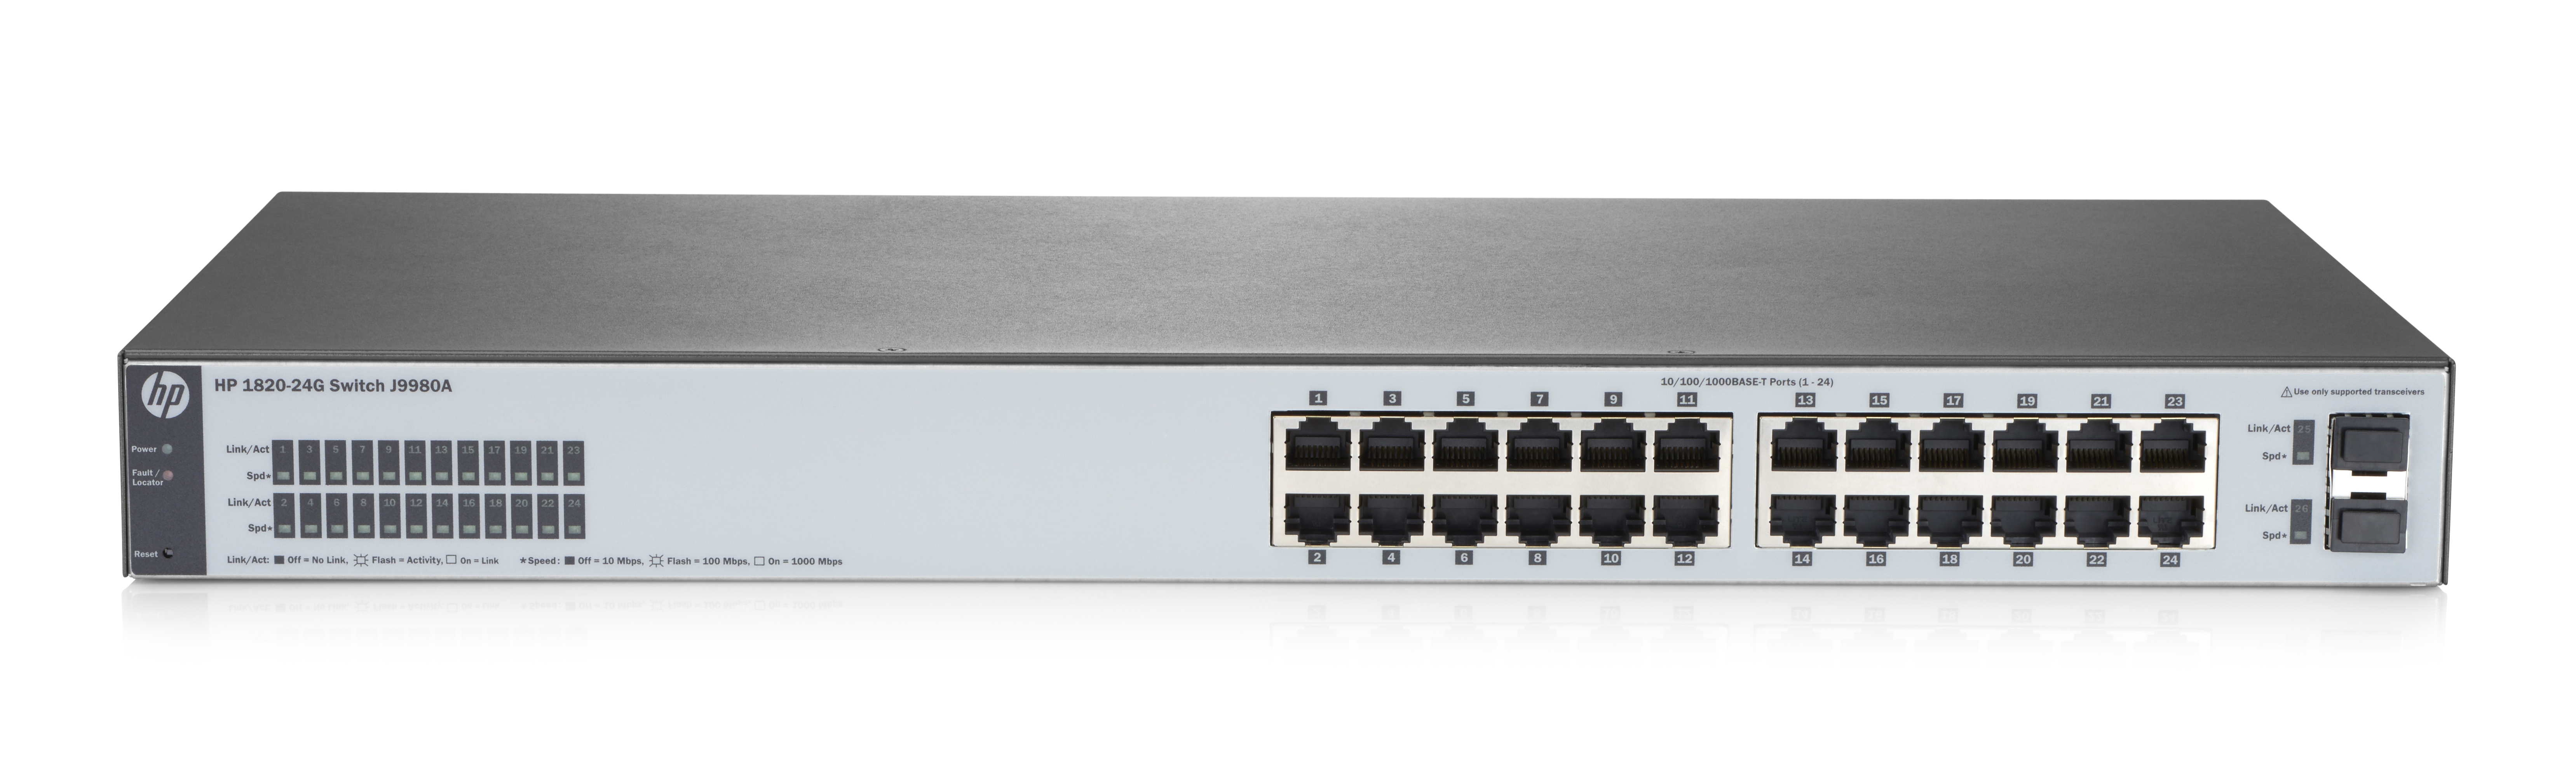 HP Enterprise 182024G Managed L2 Gigabit Ethernet (10/100/1000) Full duplex Rack mounting 1U